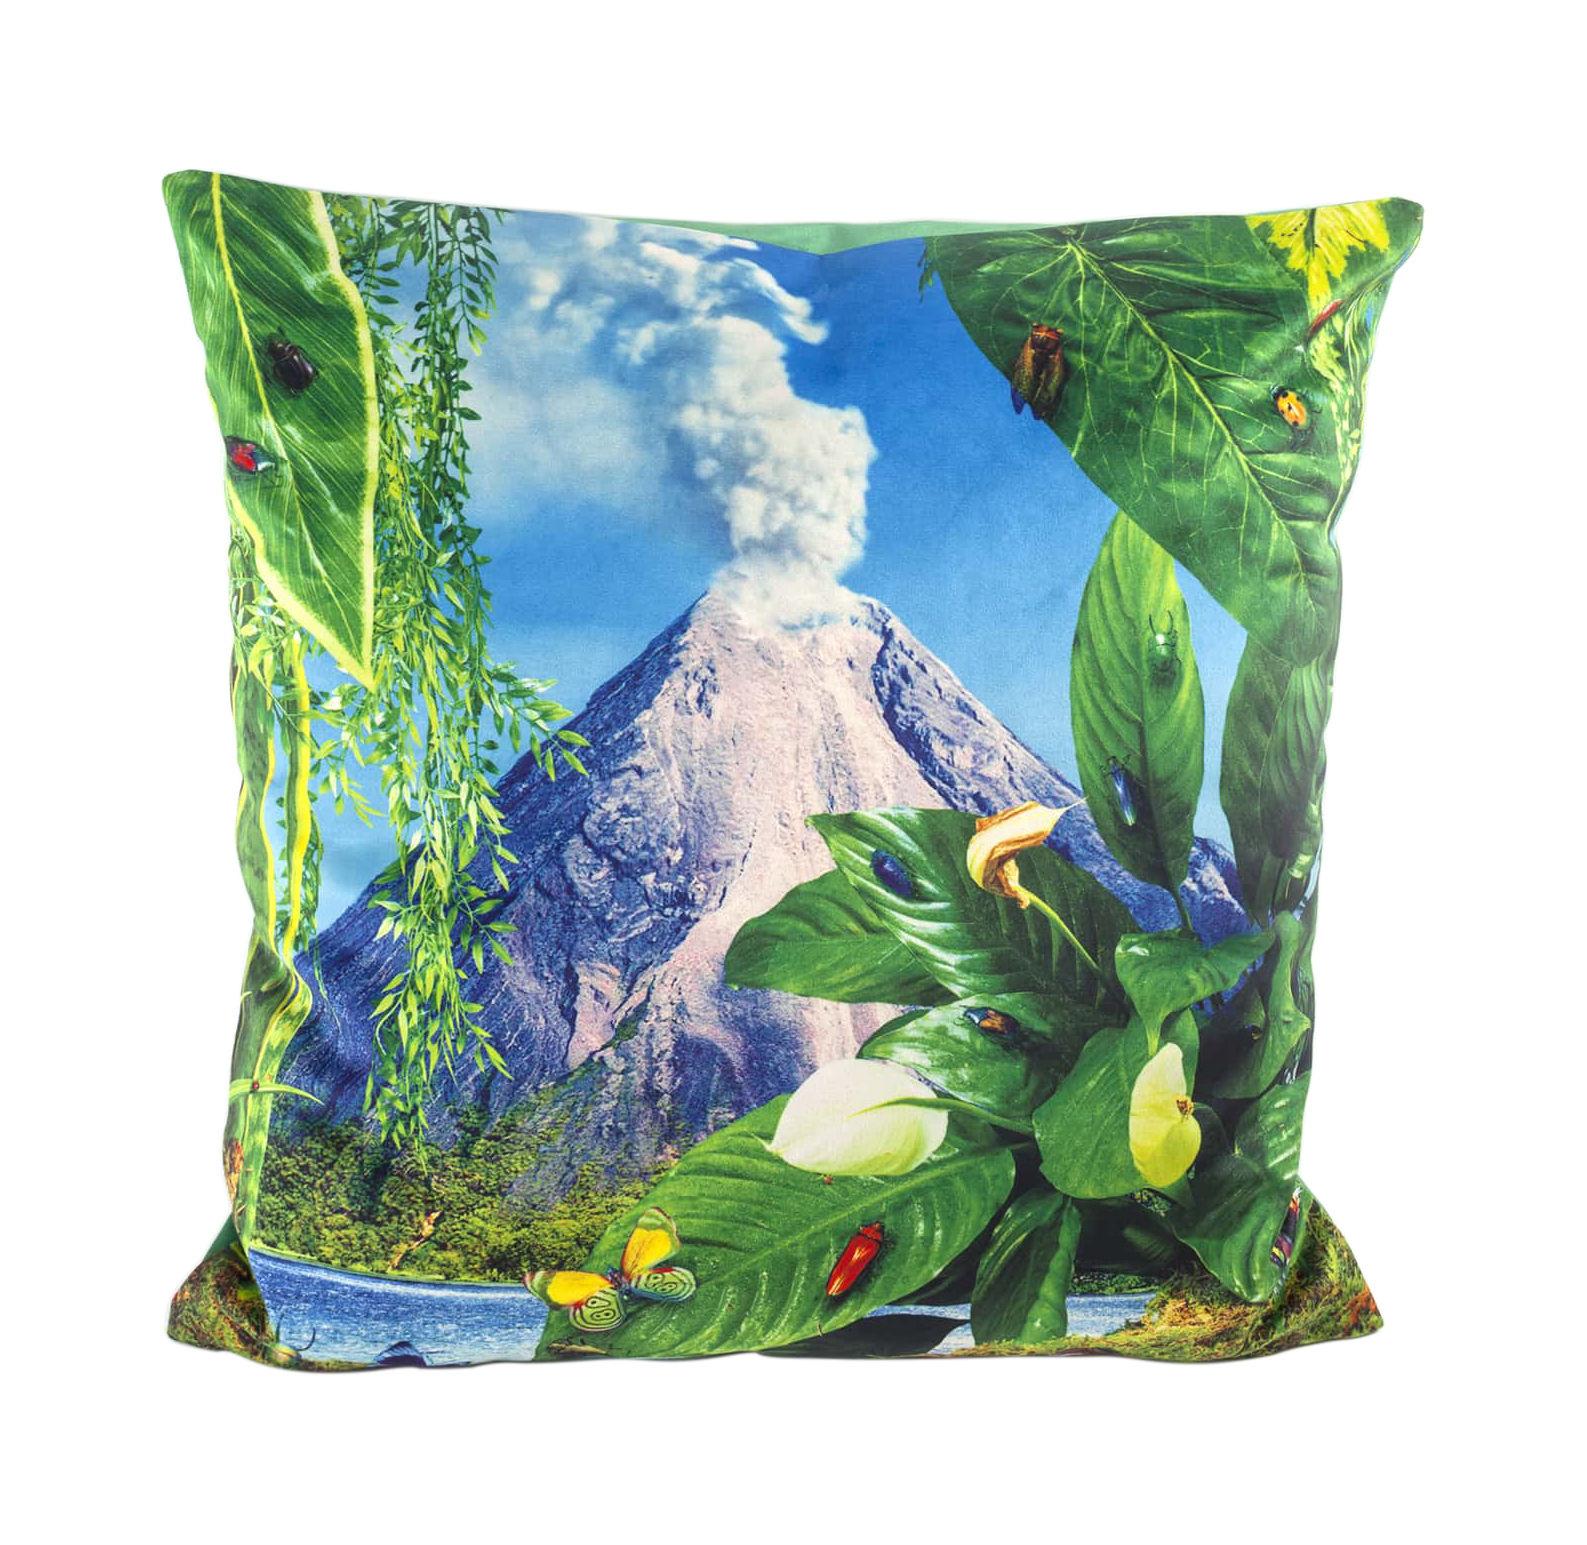 Interni - Cuscini  - Cuscino Toiletpaper - / Vulcano - 50 x 50 cm di Seletti - Vulcano / Verde - Piuma, Tessuto poliestere